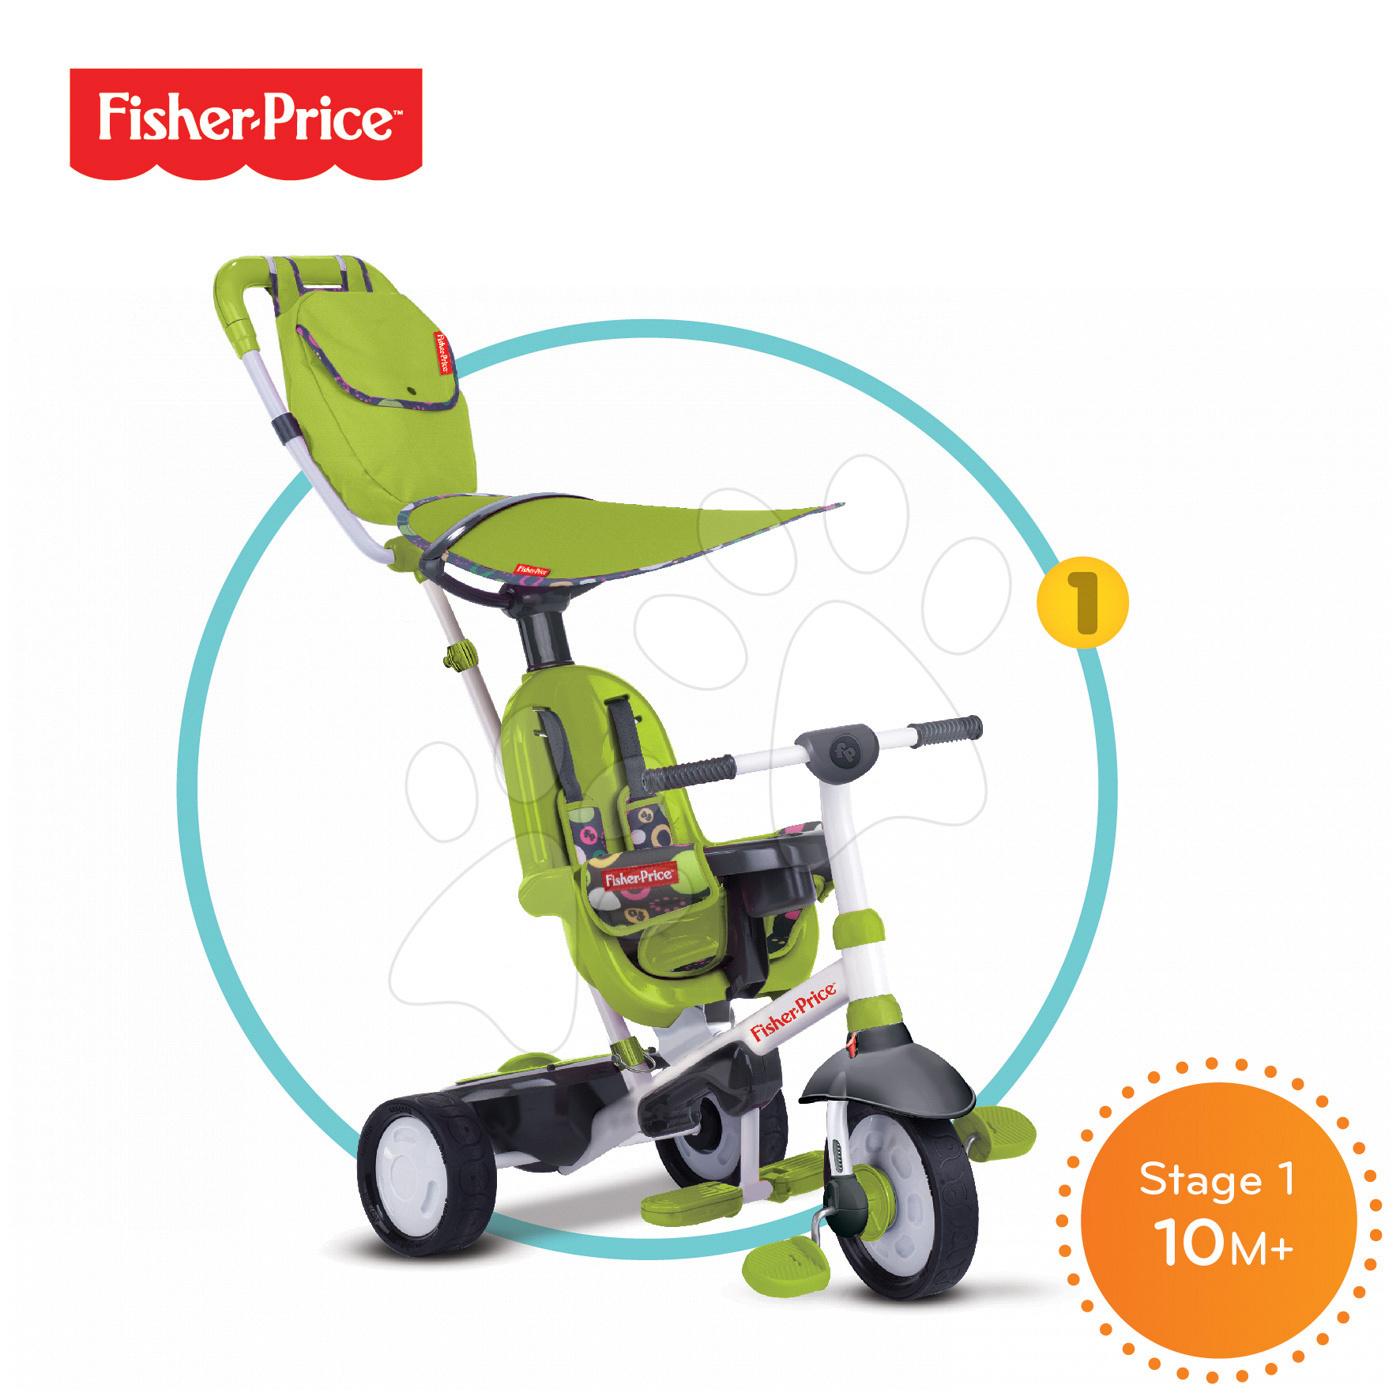 smarTrike trojkolka Fisher-Price Charisma Touch Steering 3200033 zelená